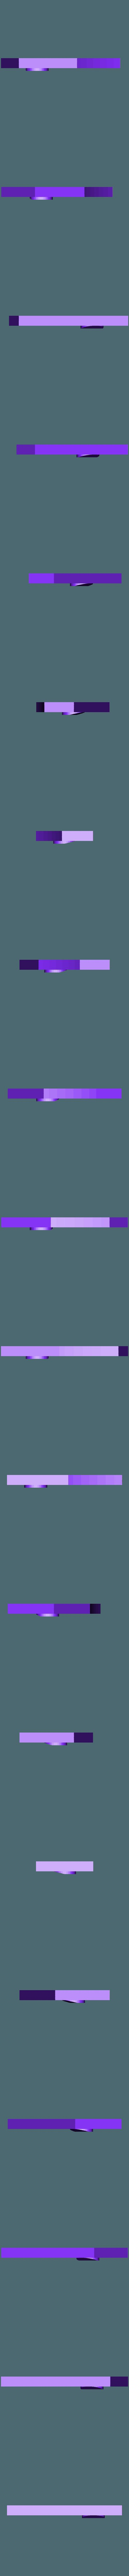 hotbed_clamp_02_right.stl Télécharger fichier STL gratuit Kossel 220mm Hot Bed Spacers / Supports • Design pour imprimante 3D, peaberry